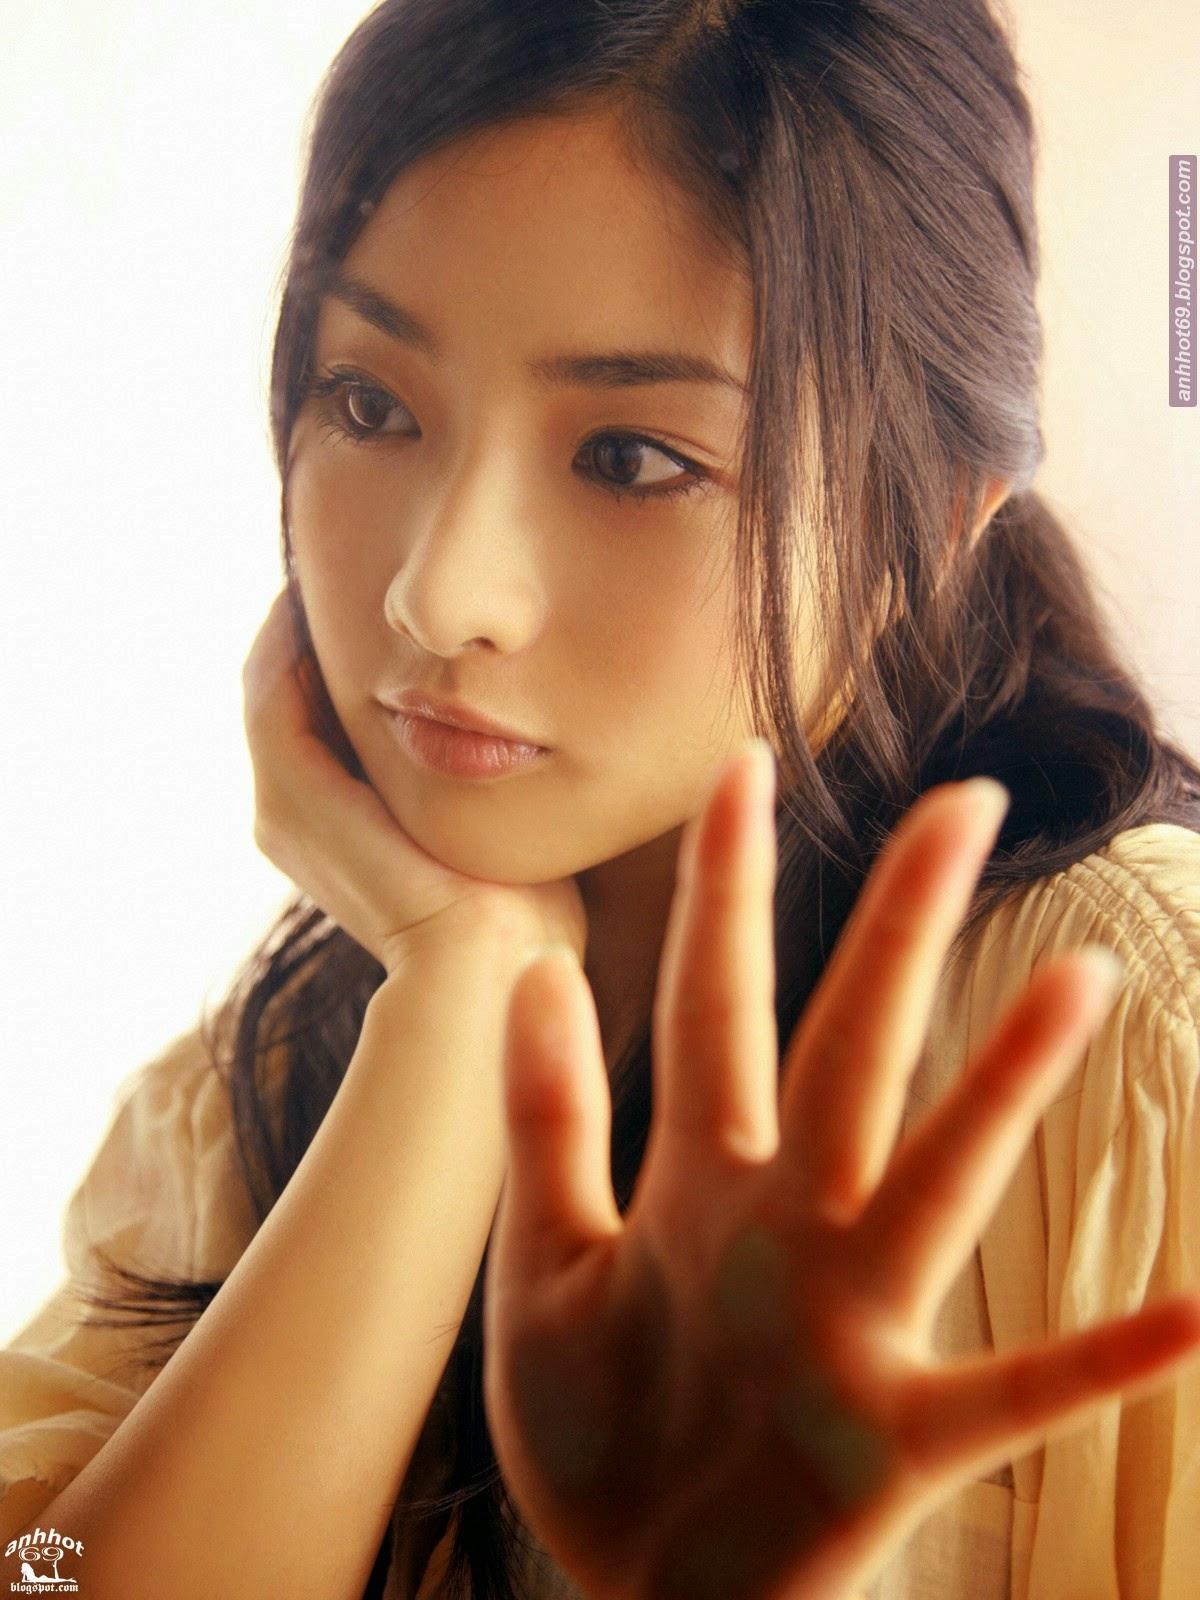 satomi-ishihara-00503954